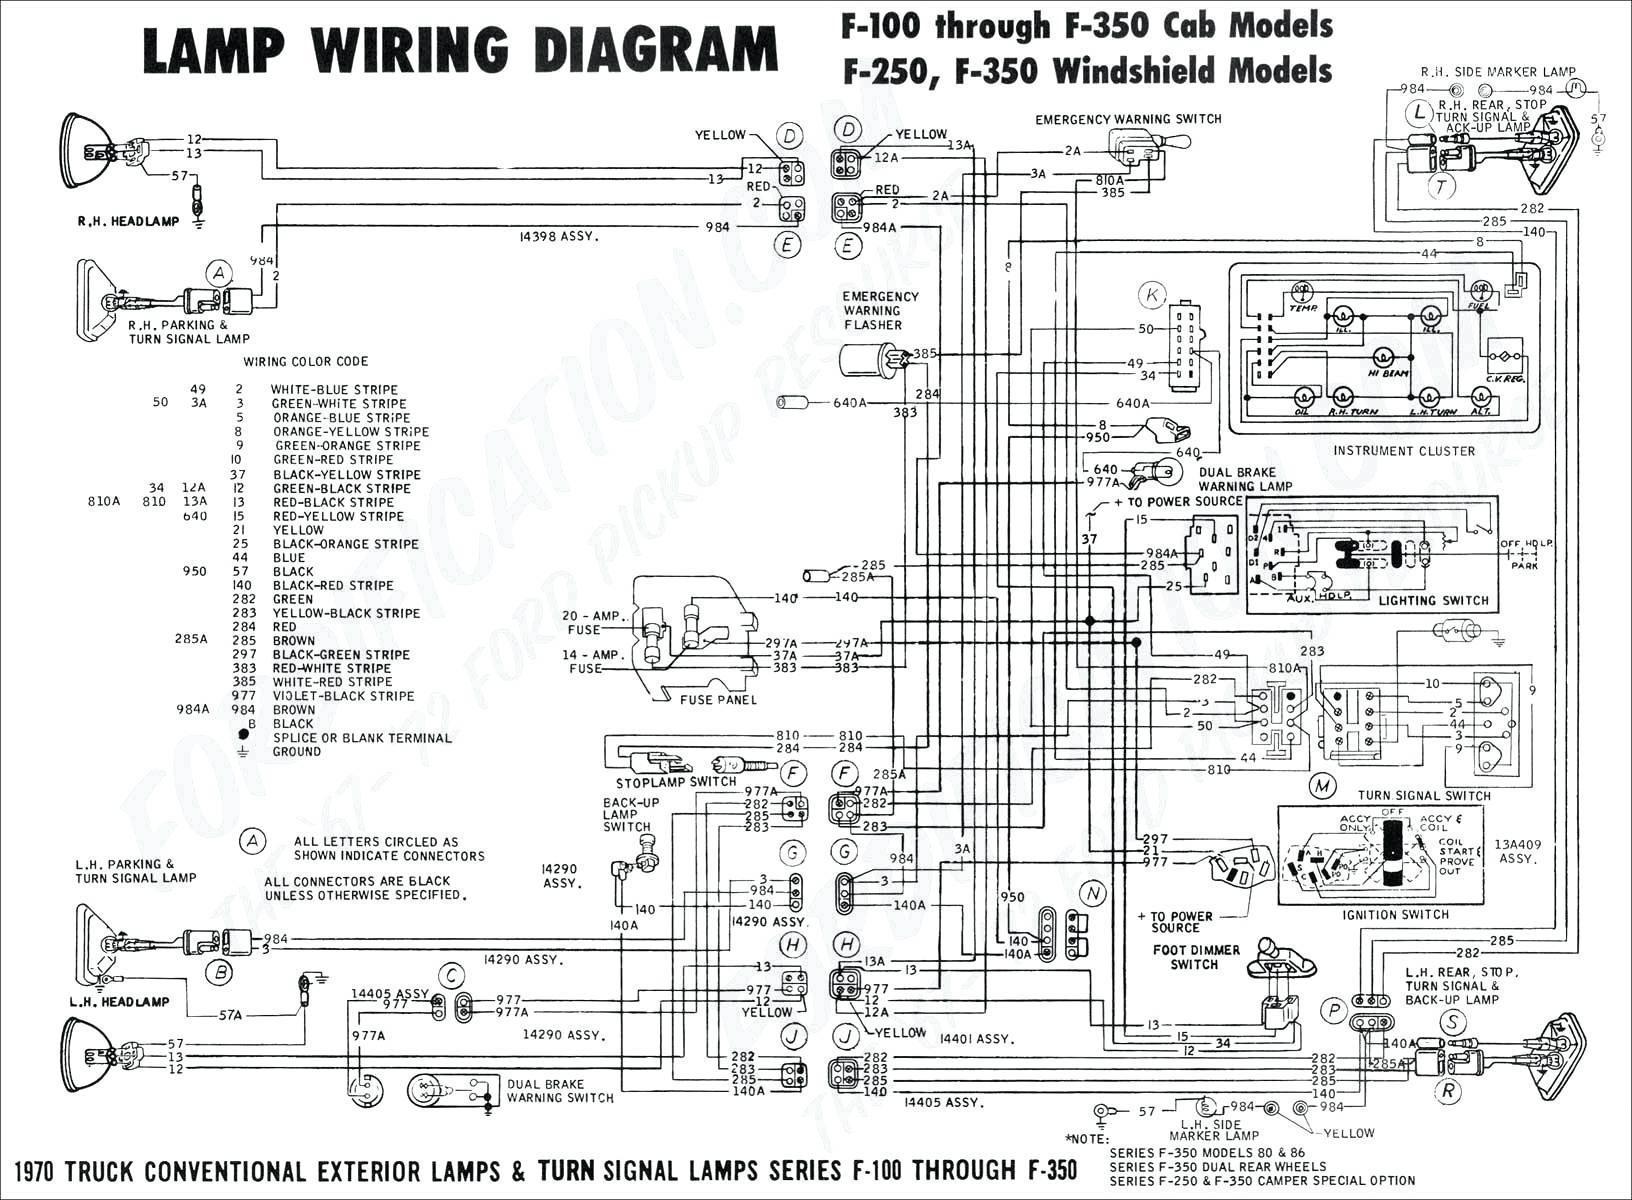 2008 Dodge Caravan Engine Diagram 2006 Dodge Wiring Diagram Another Blog About Wiring Diagram • Of 2008 Dodge Caravan Engine Diagram